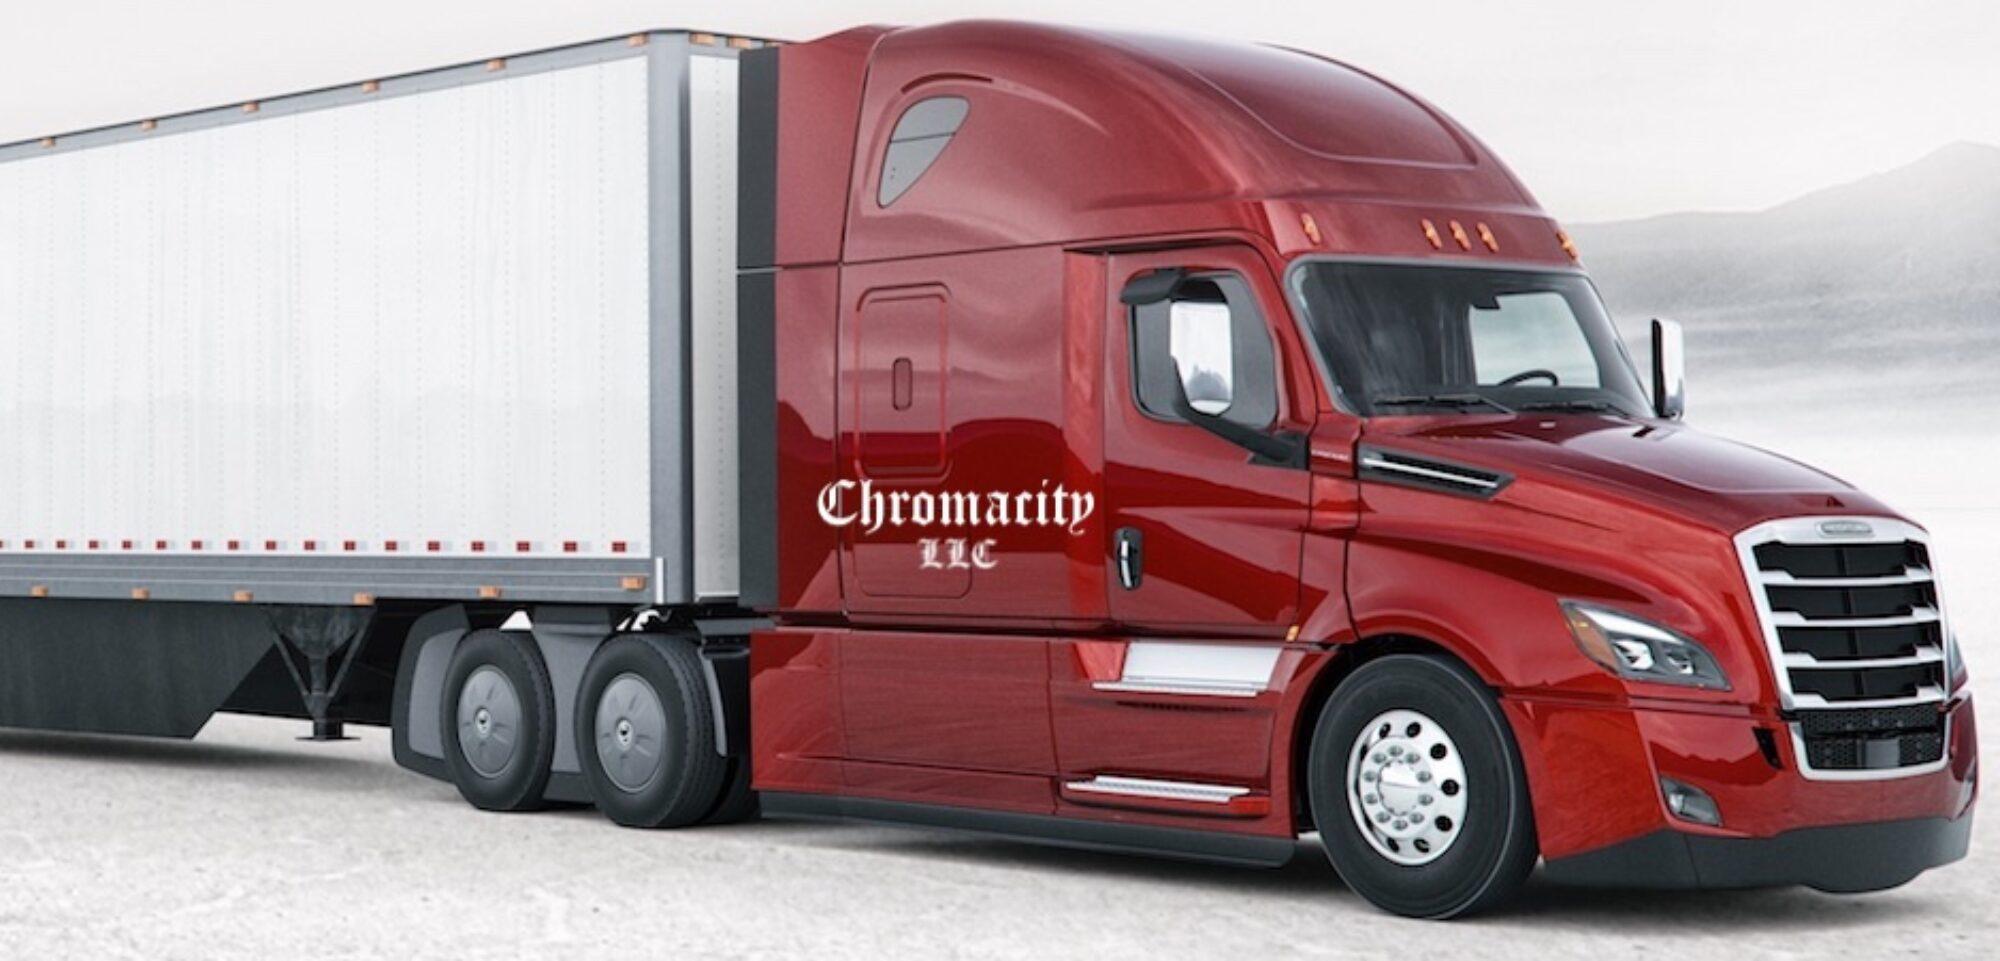 Chromacity LLC